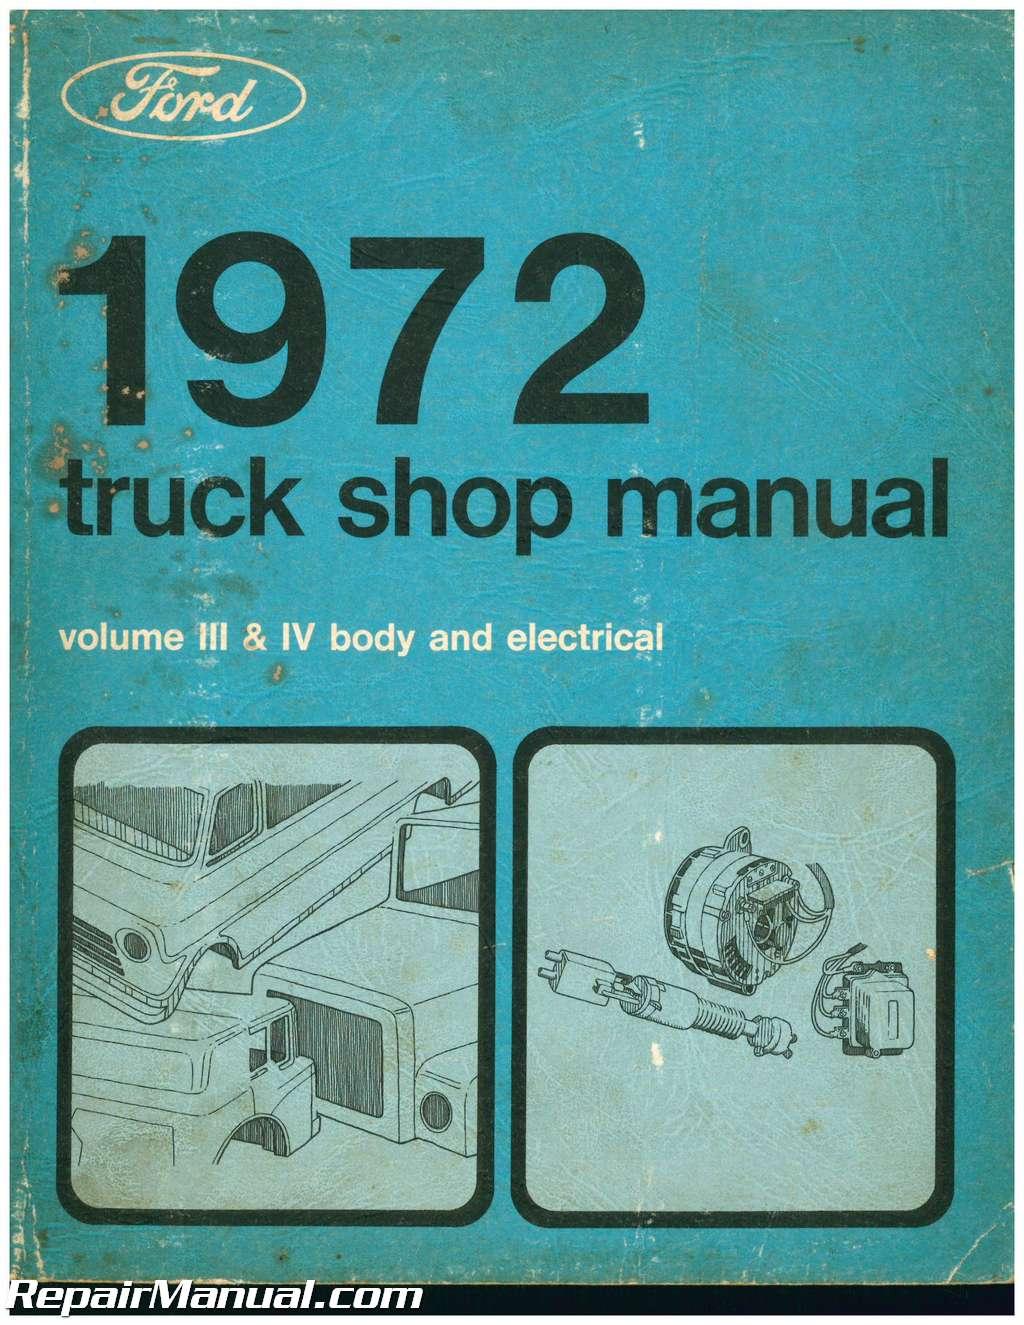 Ford Truck Shop Manual Polaris Electric Terminal Fuse Circuit Board Genesis Ffi Ficht Virage Array Used 1972 Volume 3 4 Body And Electrical Rh Repairmanual